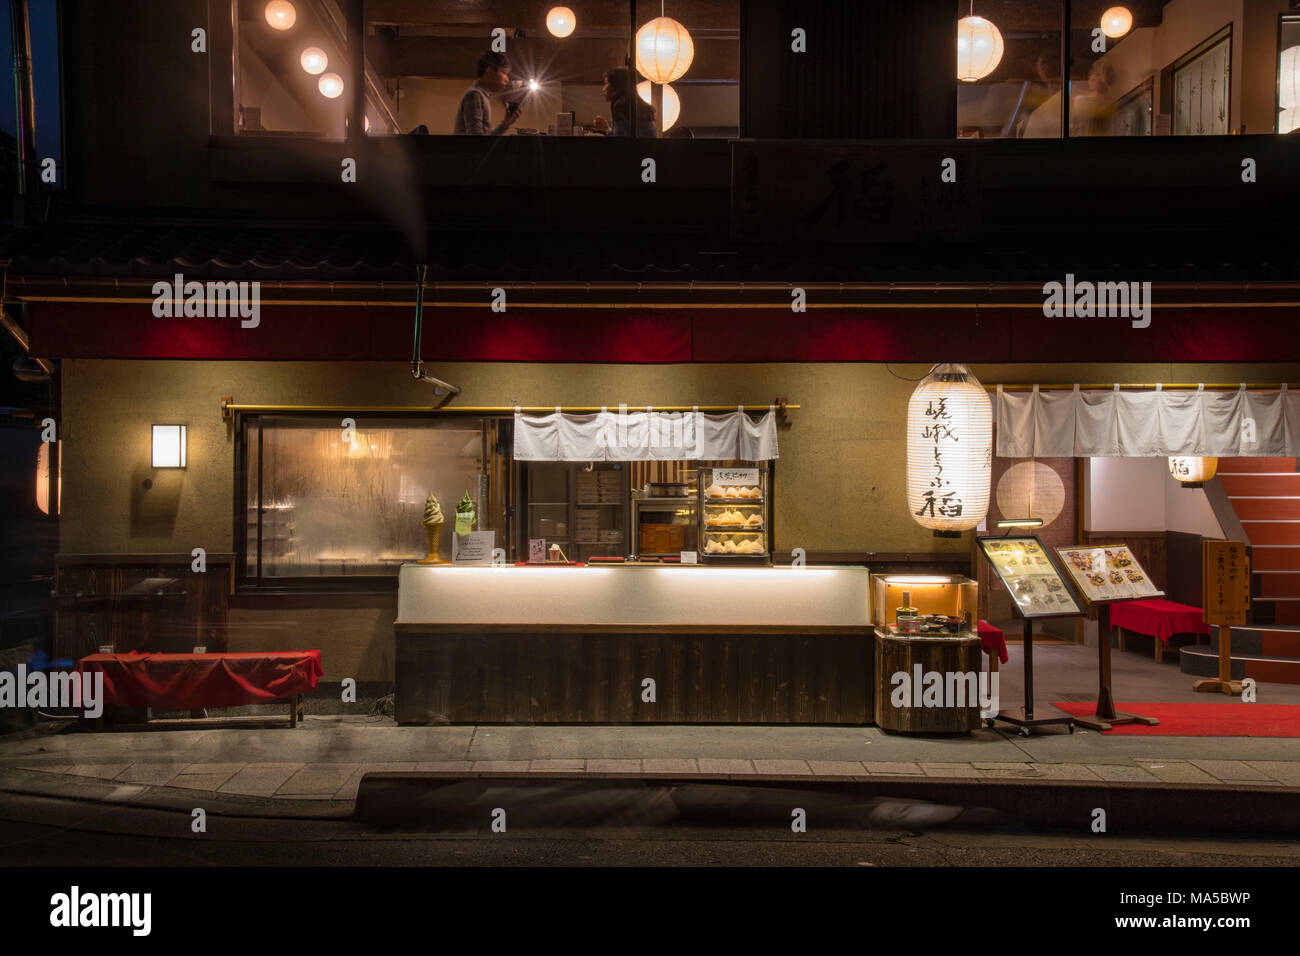 Asia, Japan, Nihon, Nippon, Kyoto, Japanese Restaurant - Stock Image